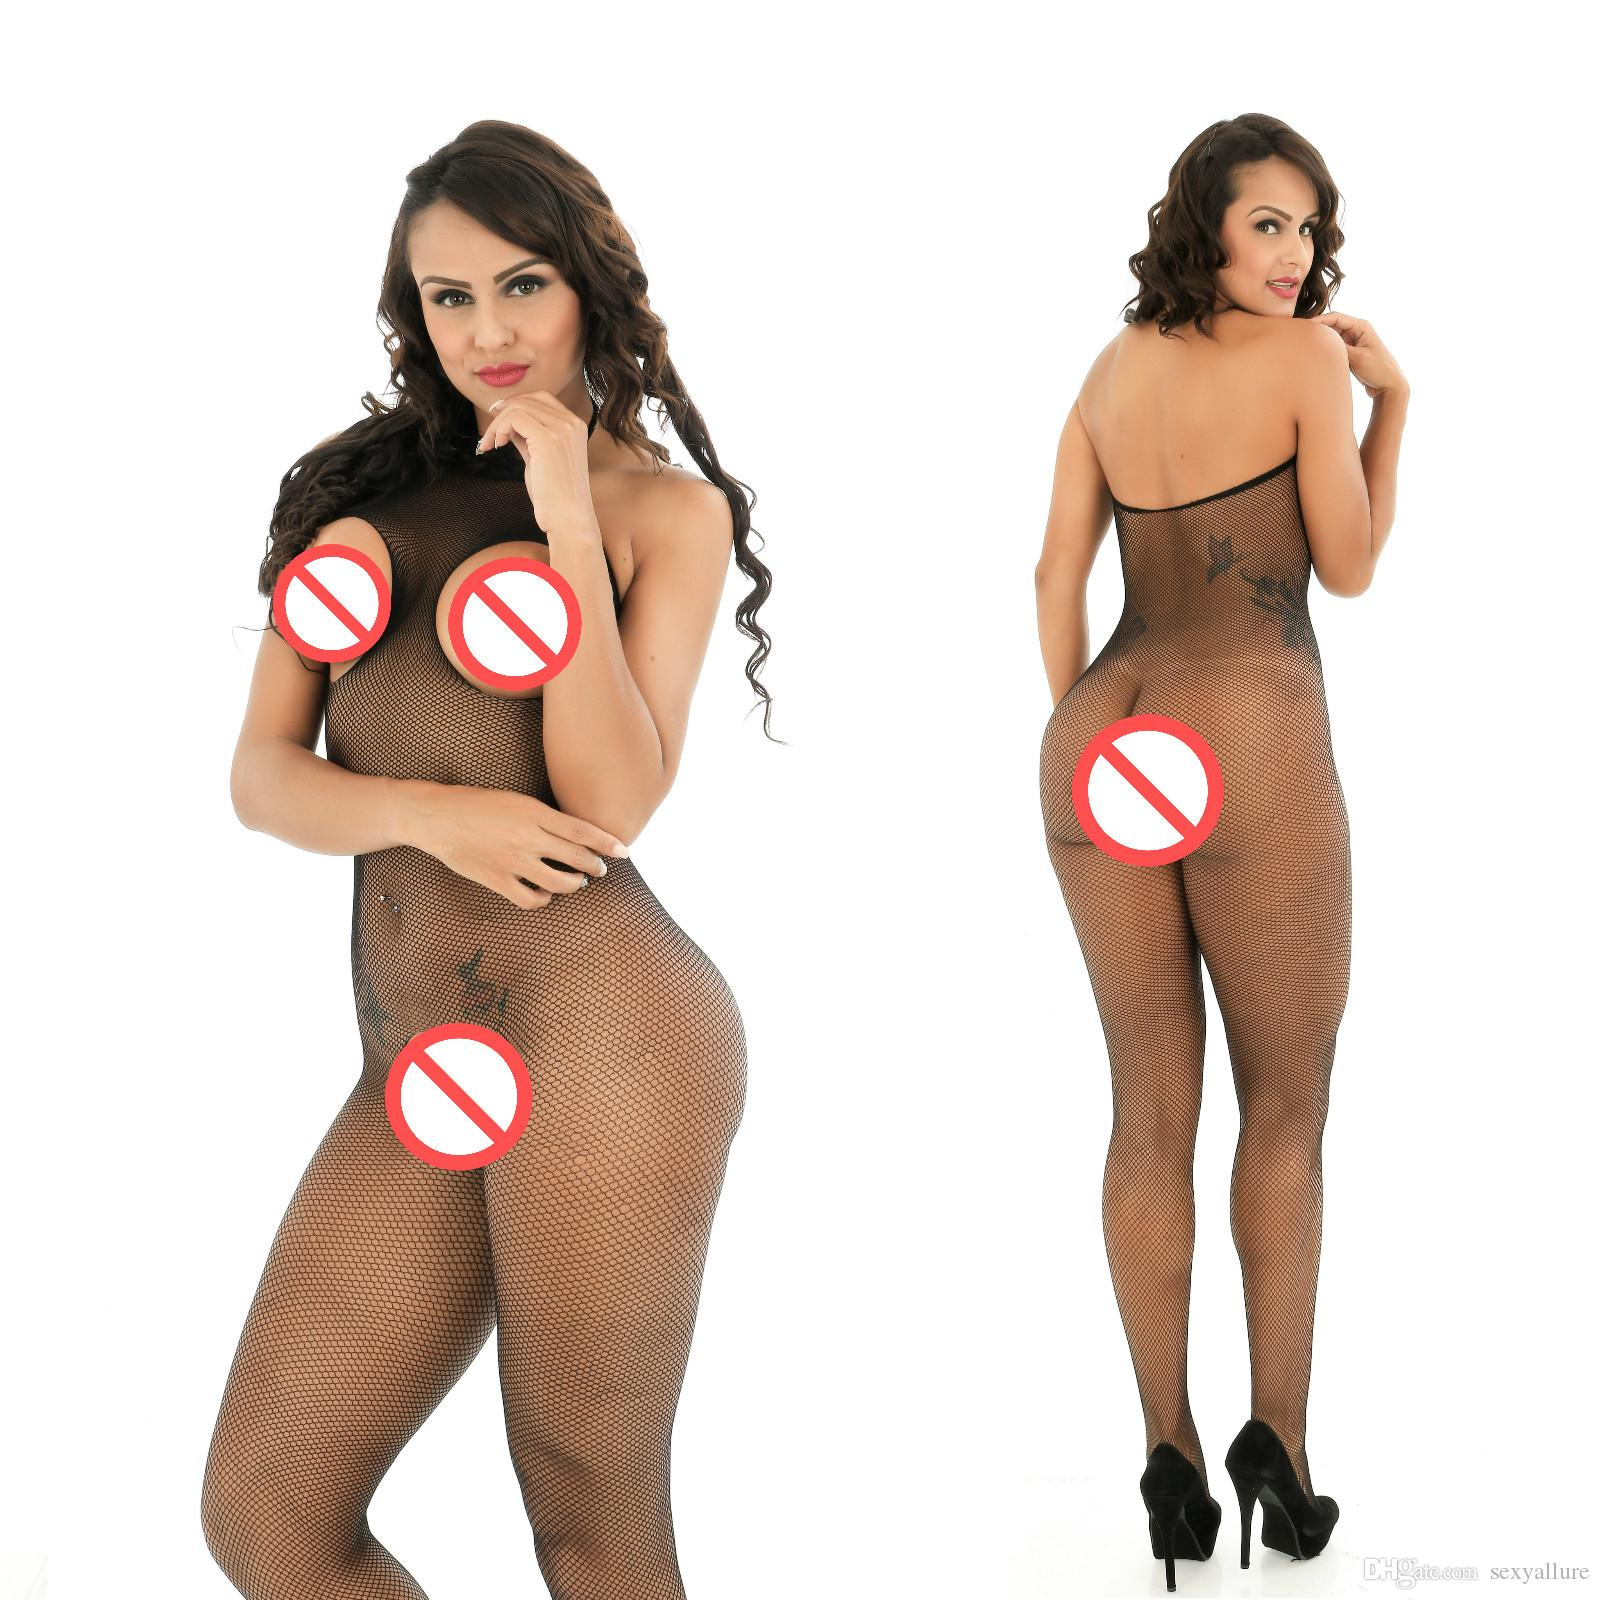 2017 Body costume Femmes Sexy Lingerie Sheer Nylon Corps Stocking Halter ouvert Buste Crotchless Corps Bas Collants Exotic Apparel Vêtements De Nuit